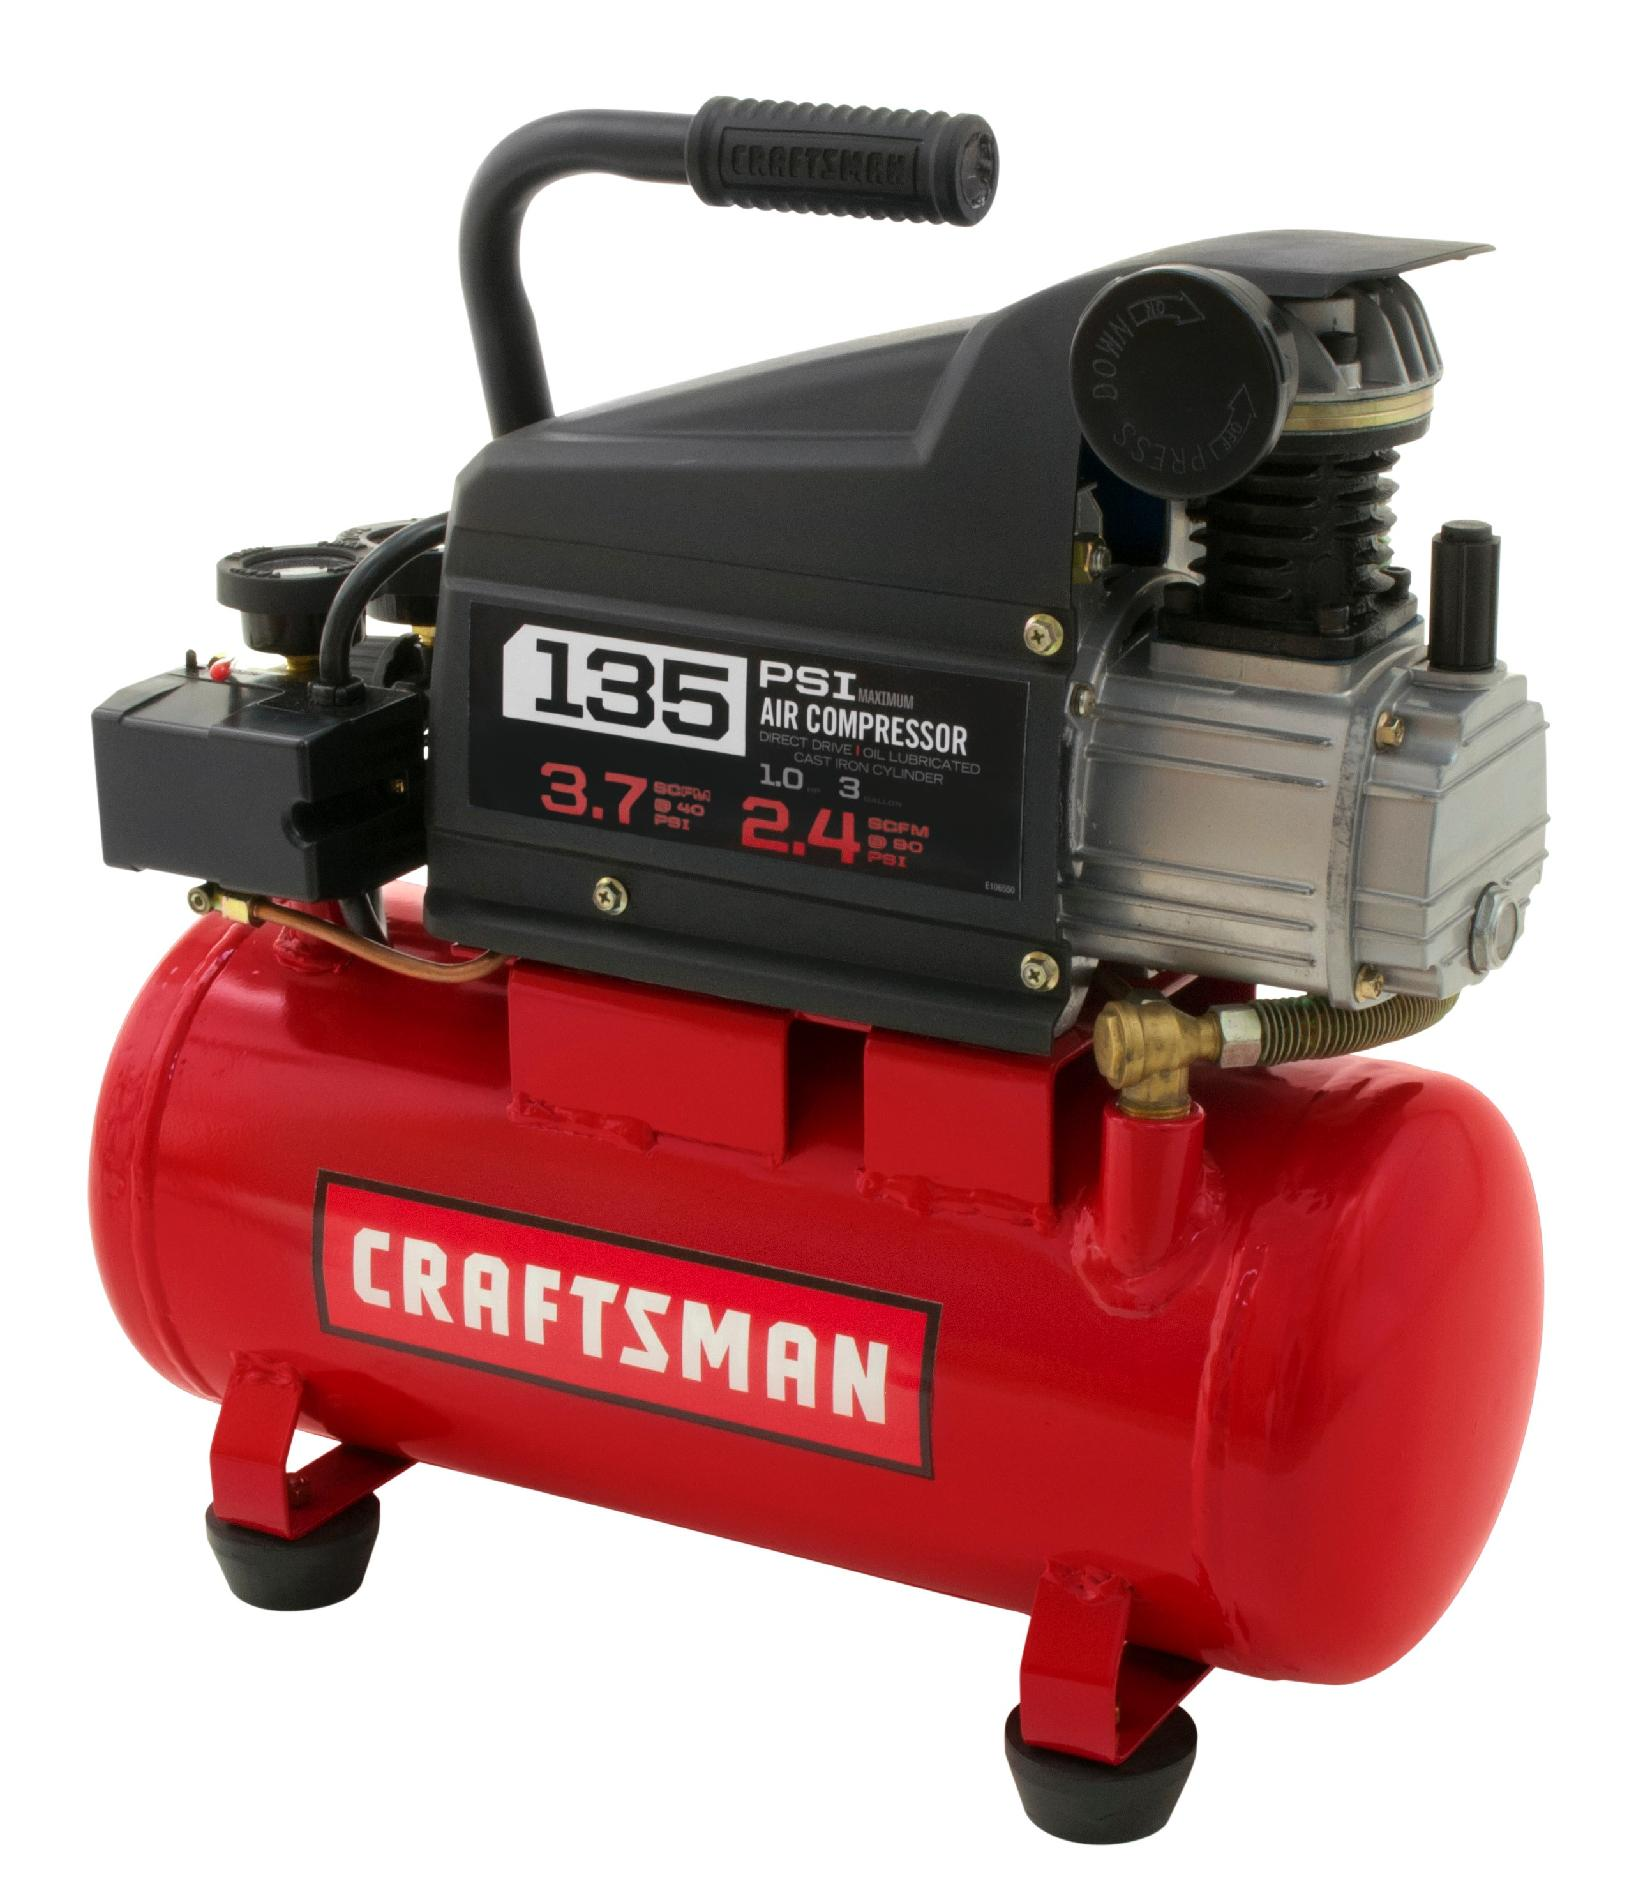 Craftsman 3 Gallon 1.0 HP Oil-Lubricated Air Compressor & Accessory Kit  135 Max PSI